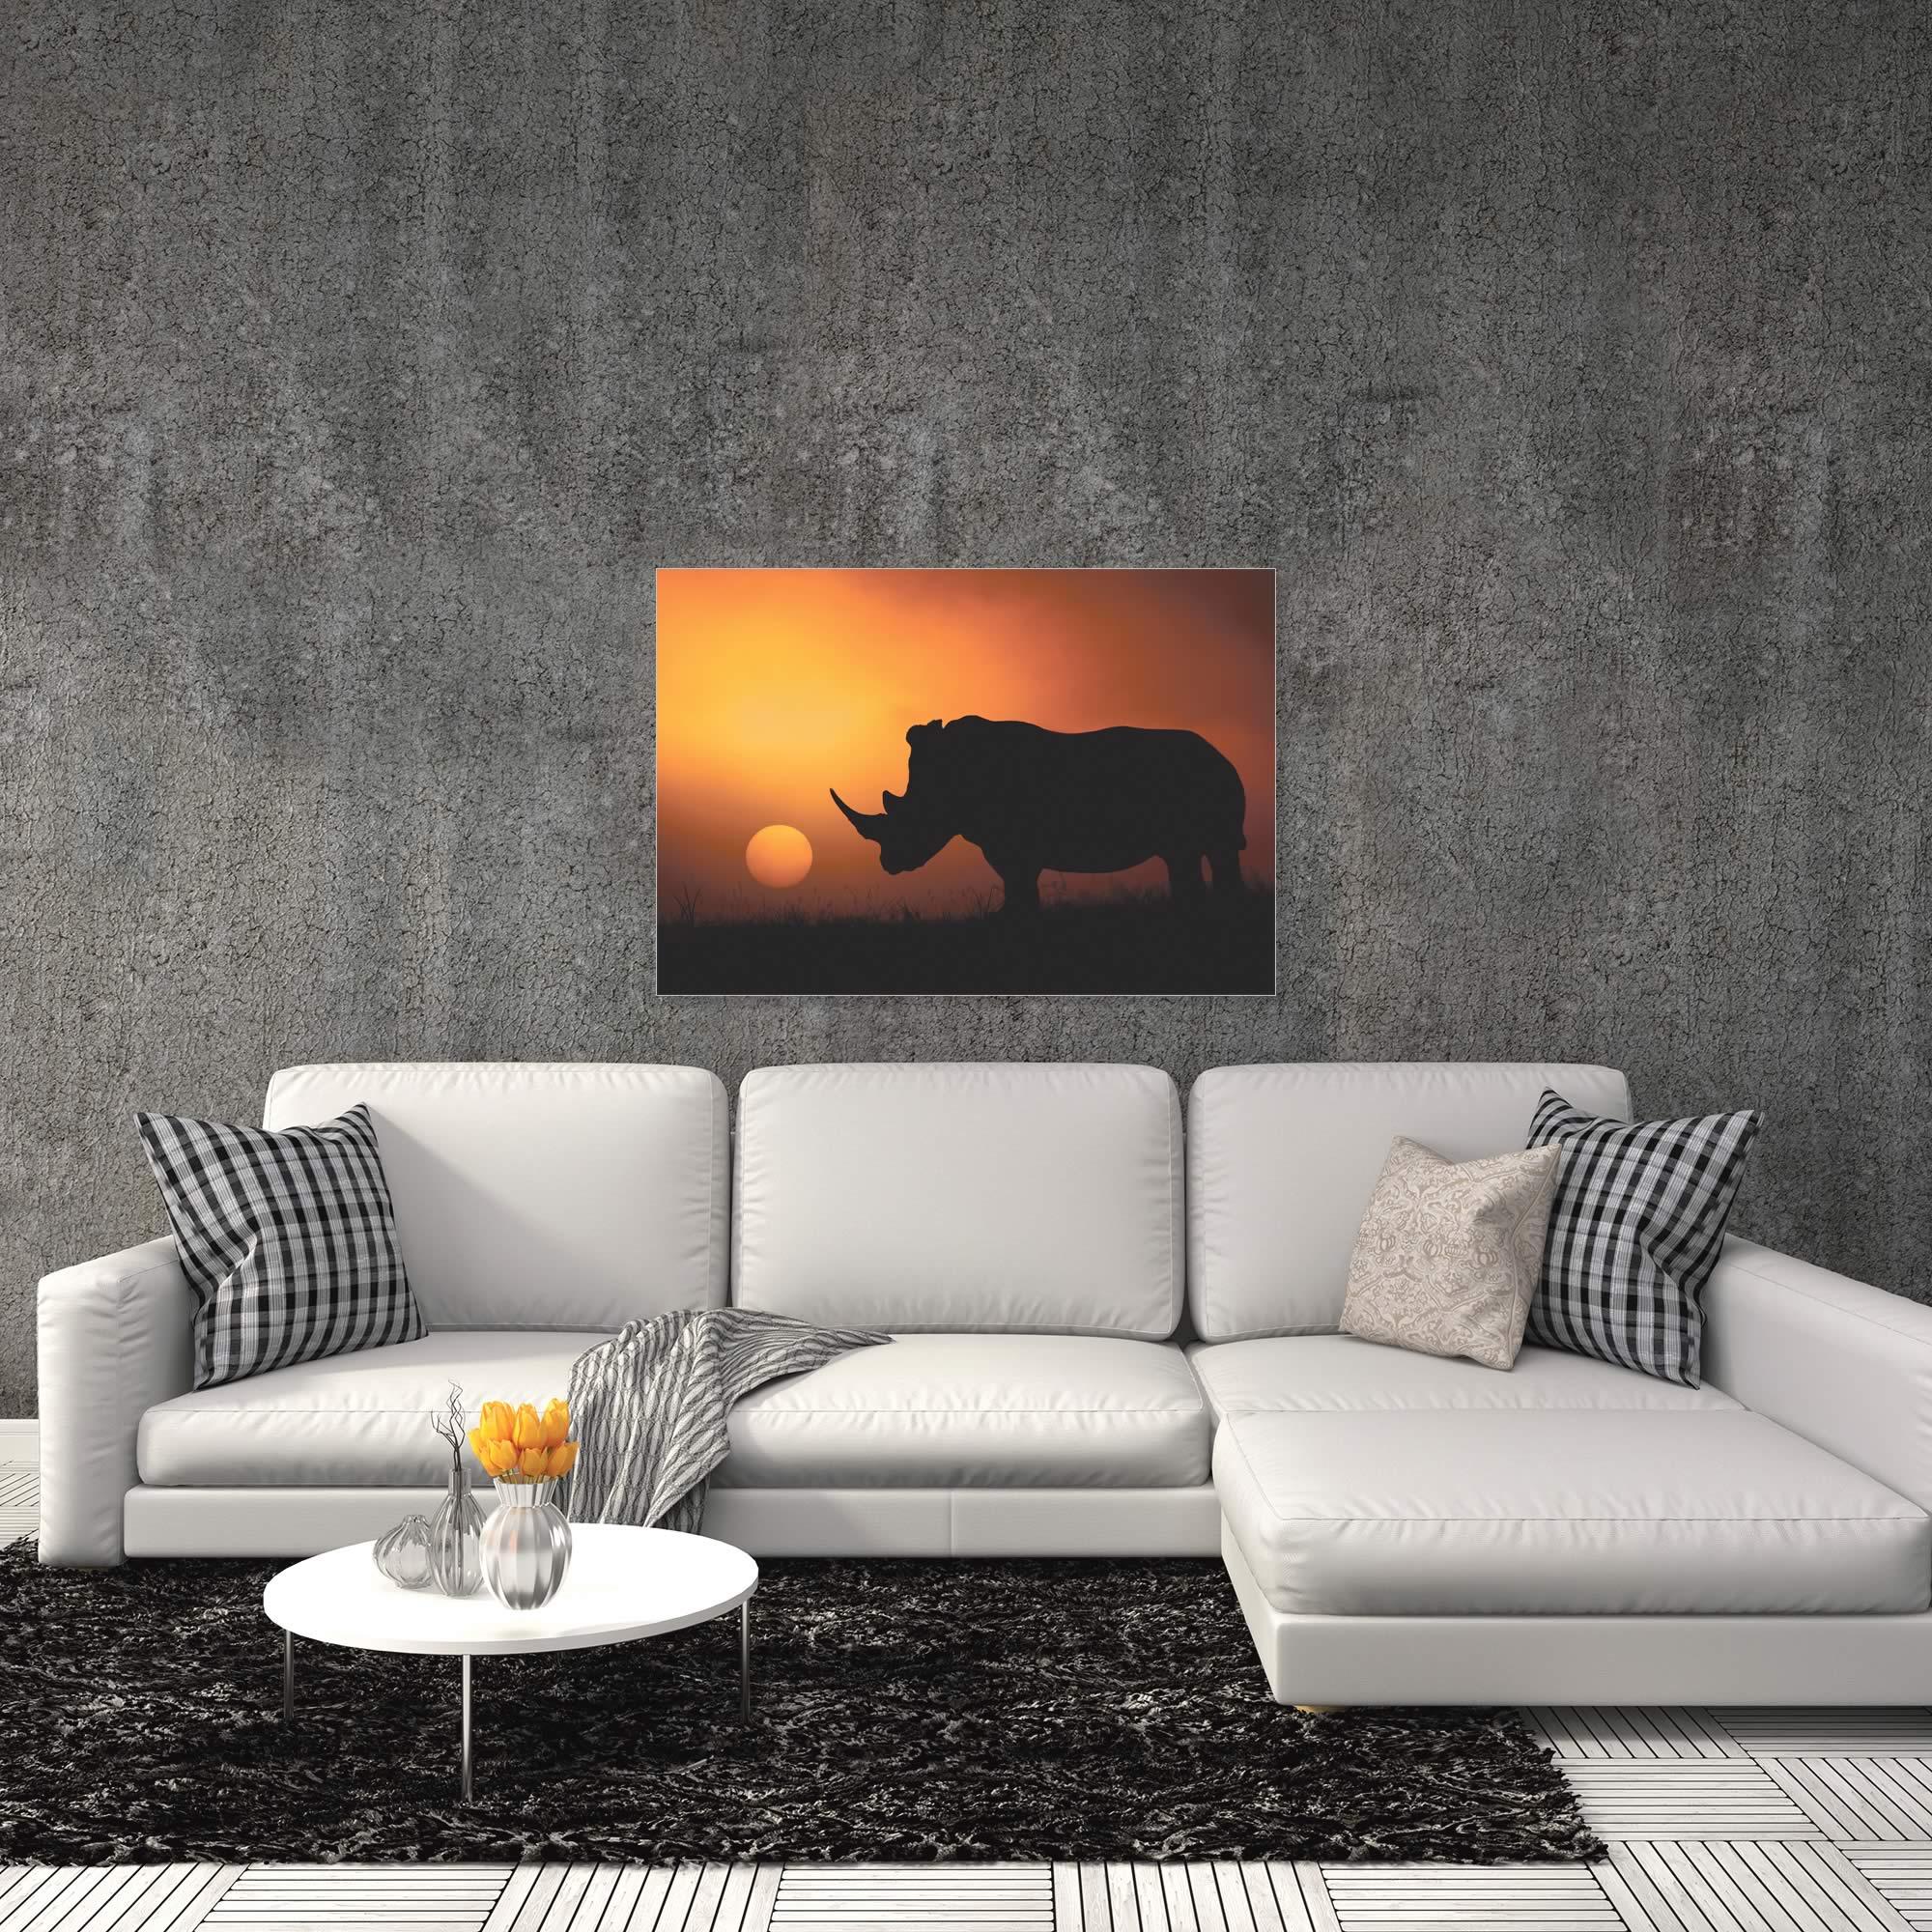 Rhino Sunrise by Mario Moreno - Rhino Silhouette Art on Metal or Acrylic - Alternate View 1